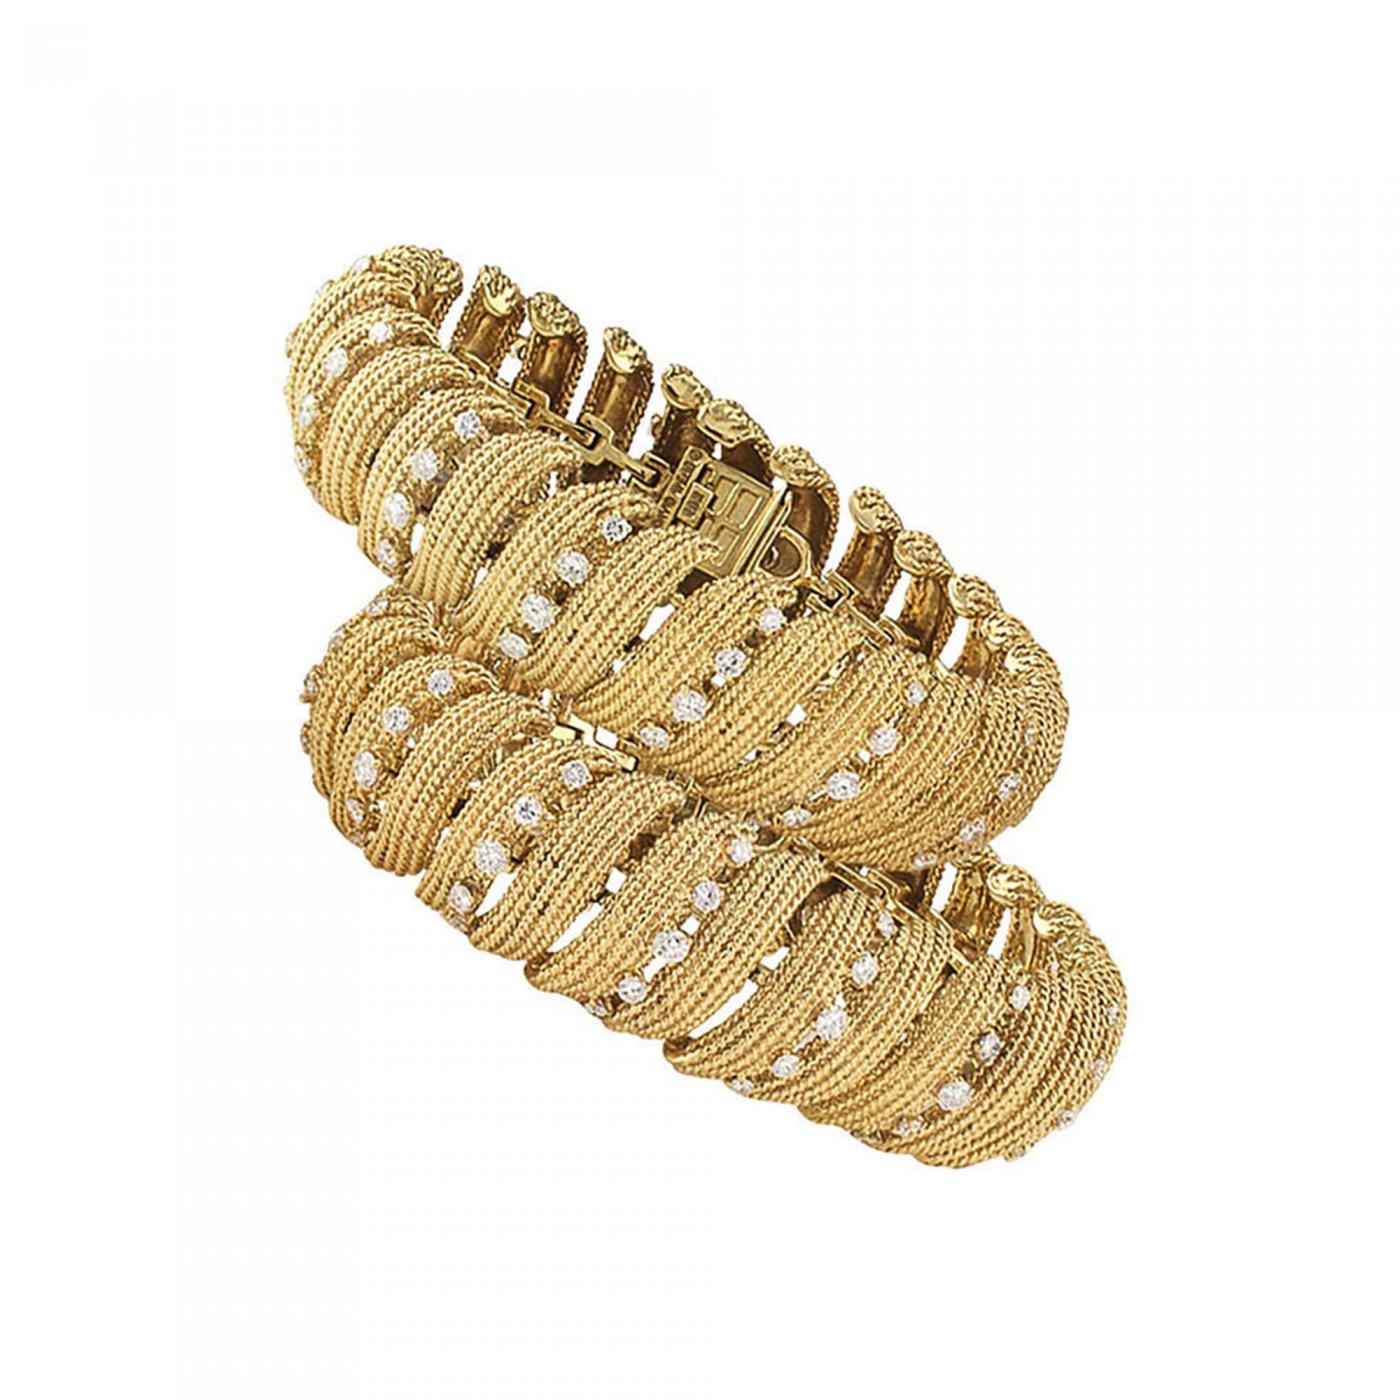 4e5a9cc15c6 David Webb Estate Twin Gold and Diamond Link Bracelets